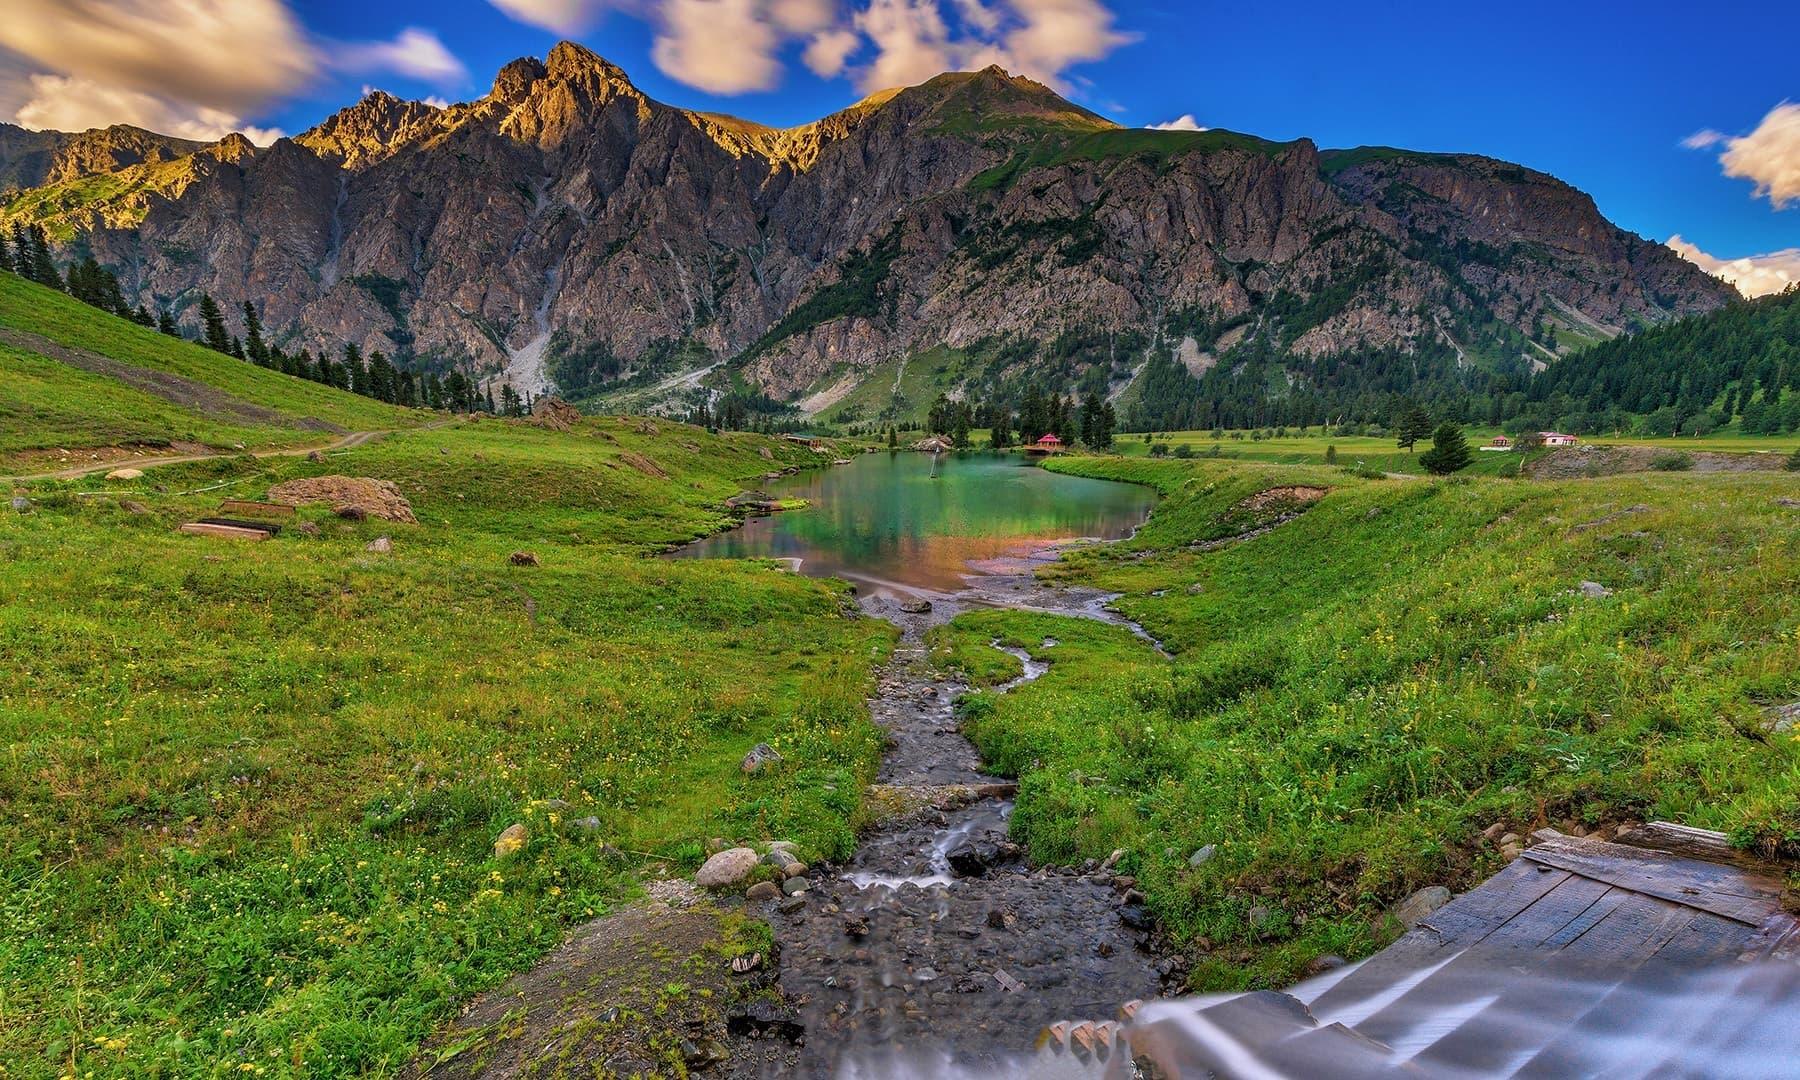 Rainbow Lake, Domel. — Photo by Syed Mehdi Bukhari